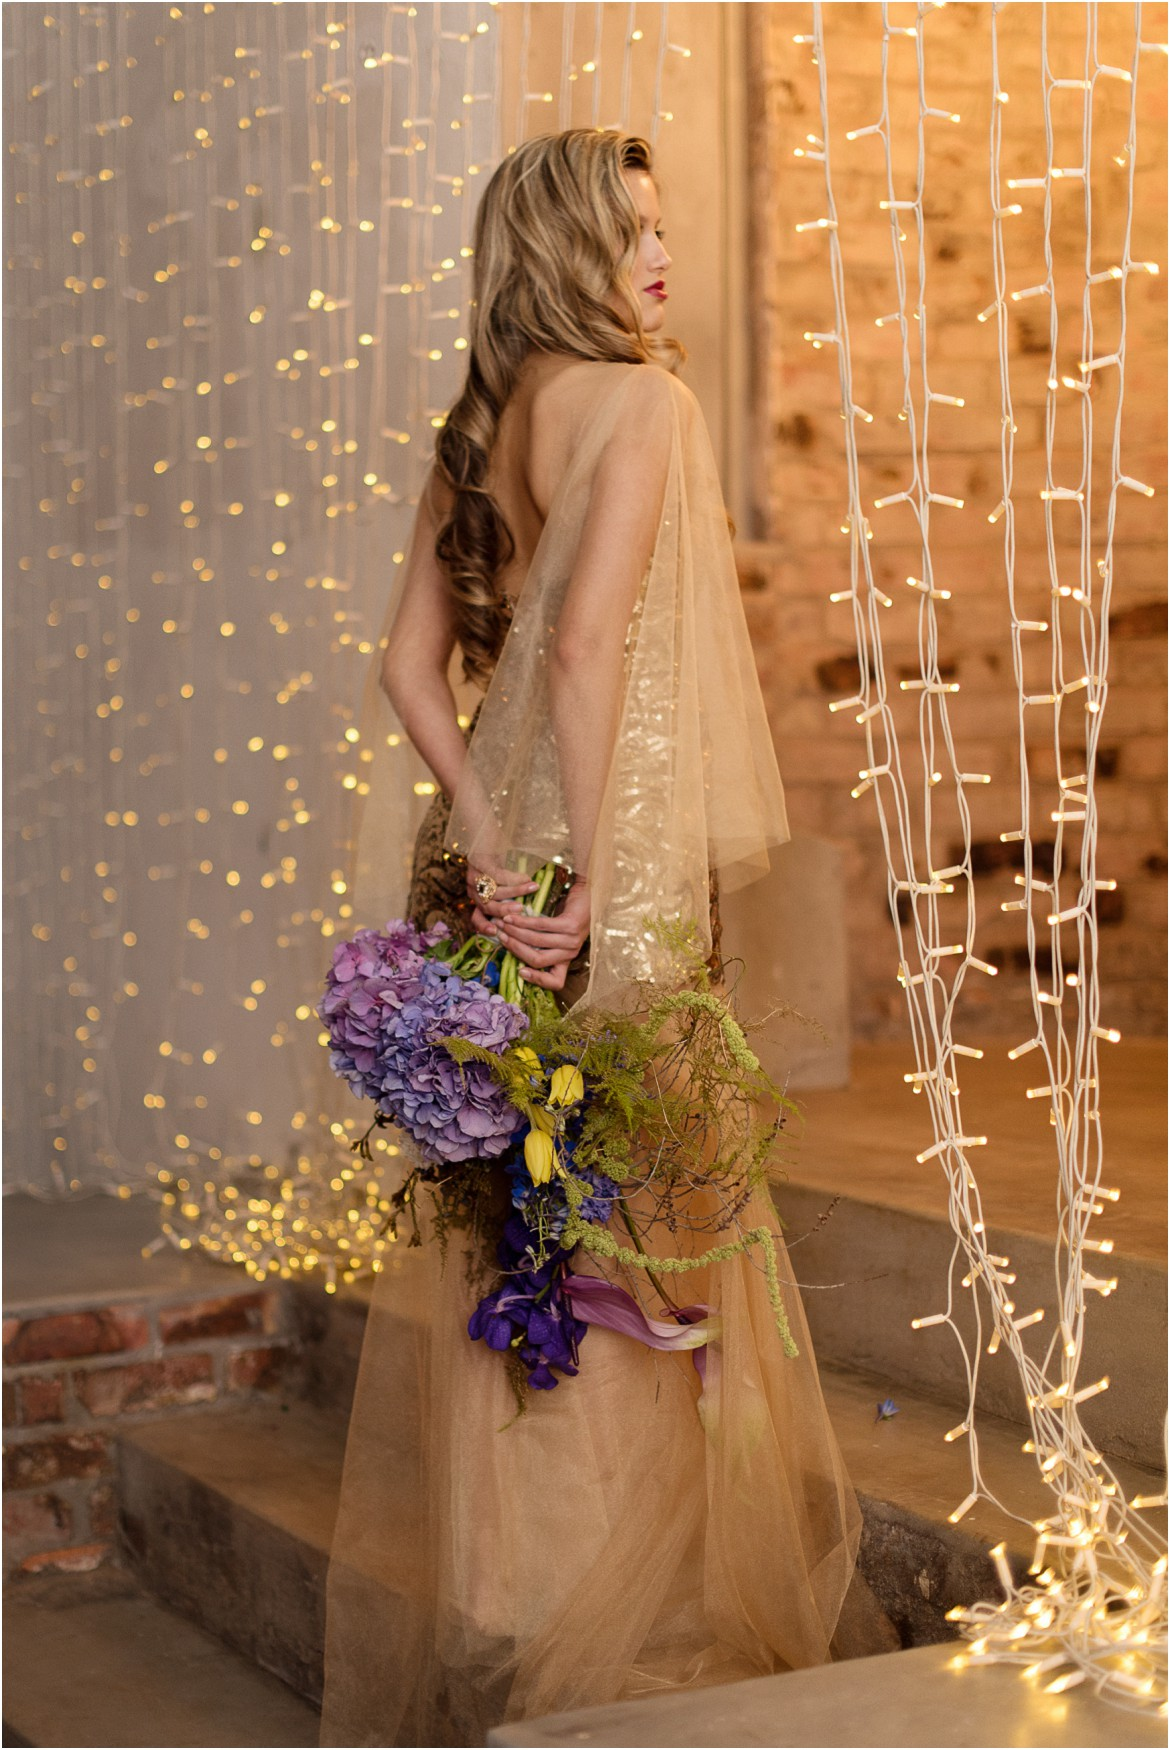 SamanthaClifton-StarryNights-BridalStyle-StyledShoot-003